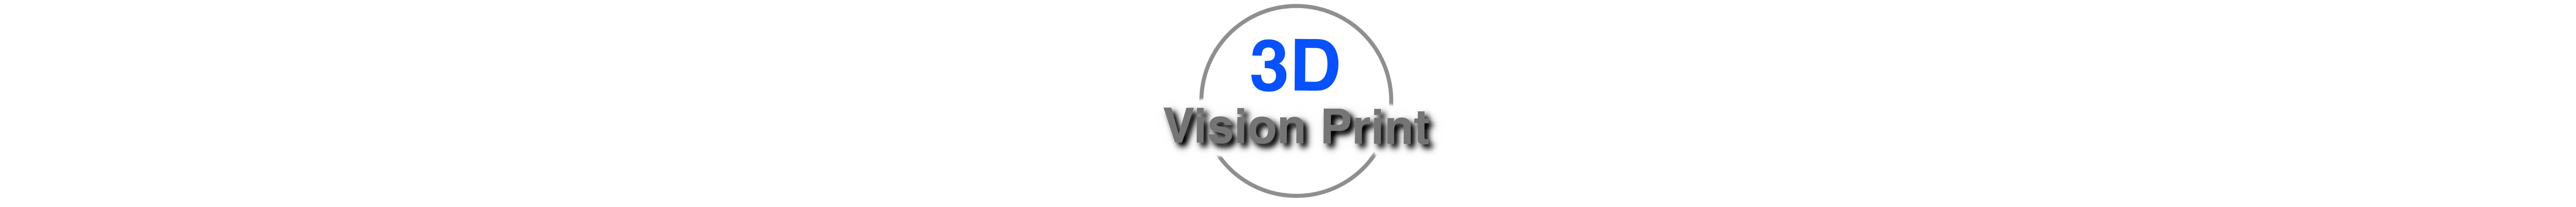 3D Vision Print